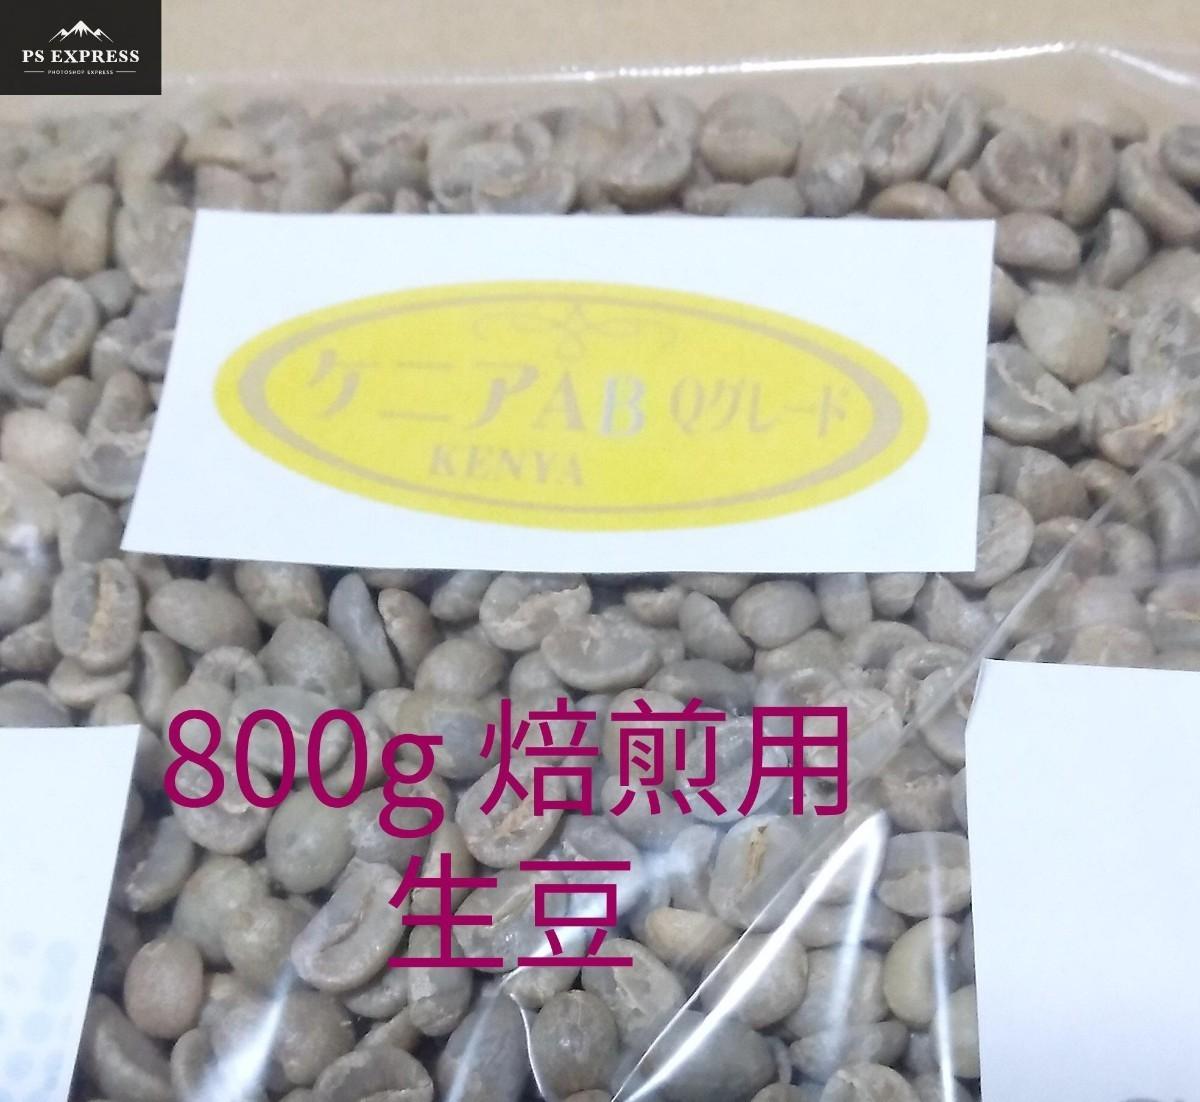 コーヒー豆 ケニア AB Qグレード 800g 焙煎用生豆